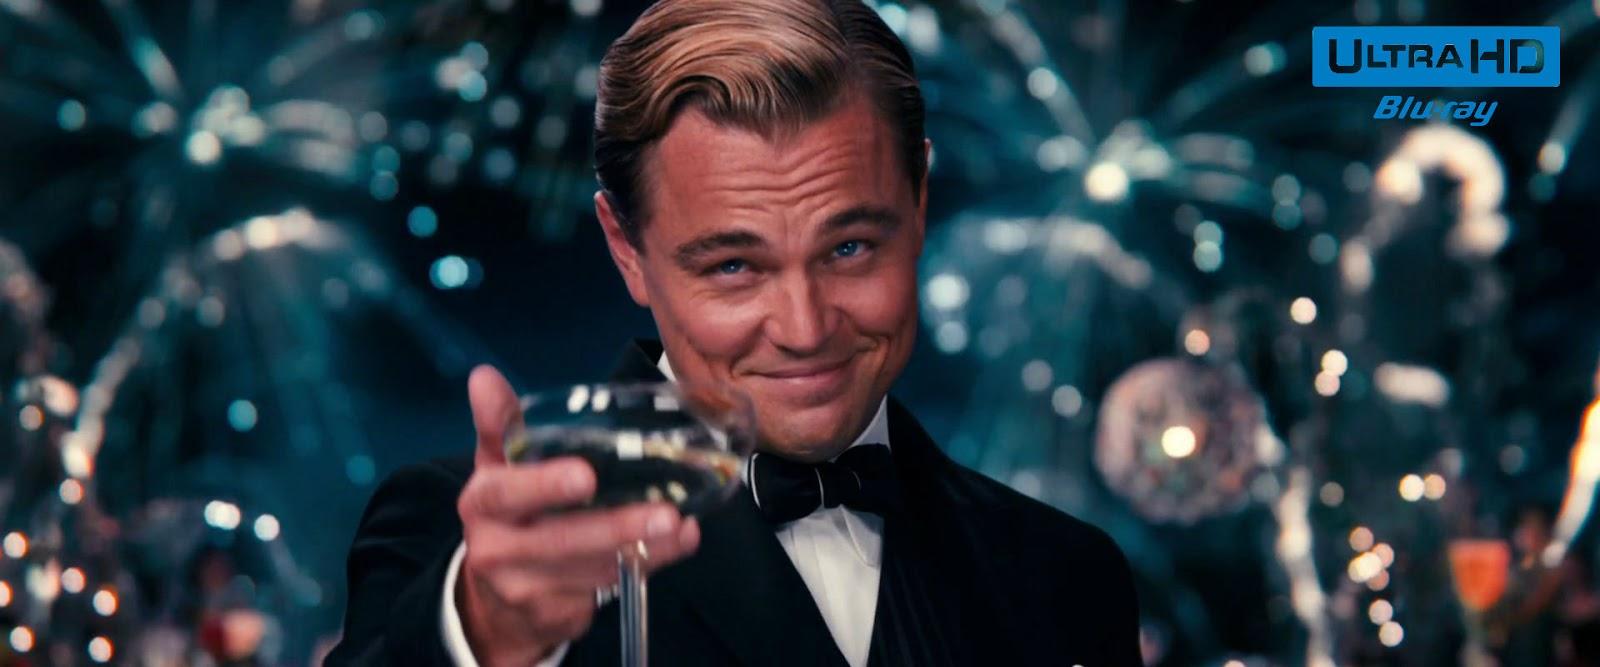 The Great Gatsby 4K (2013) 4K Ultra HD Blu-ray